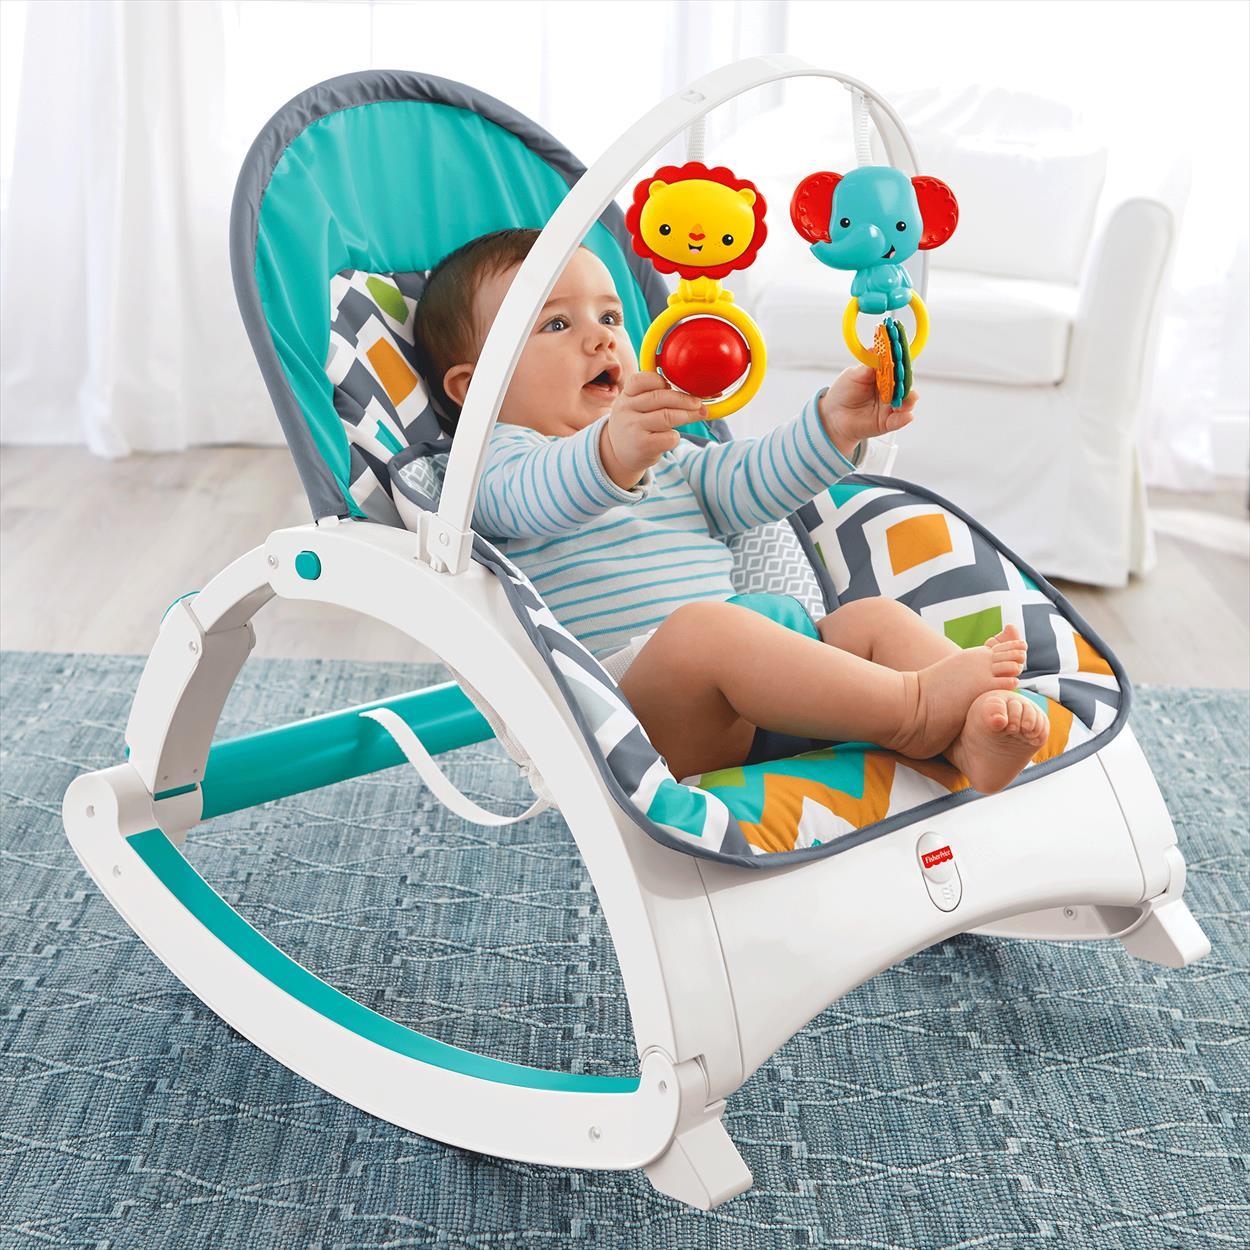 CMR13-newborn-to-toddler-rocker-glacier-wave-d-2_h1250.jpg